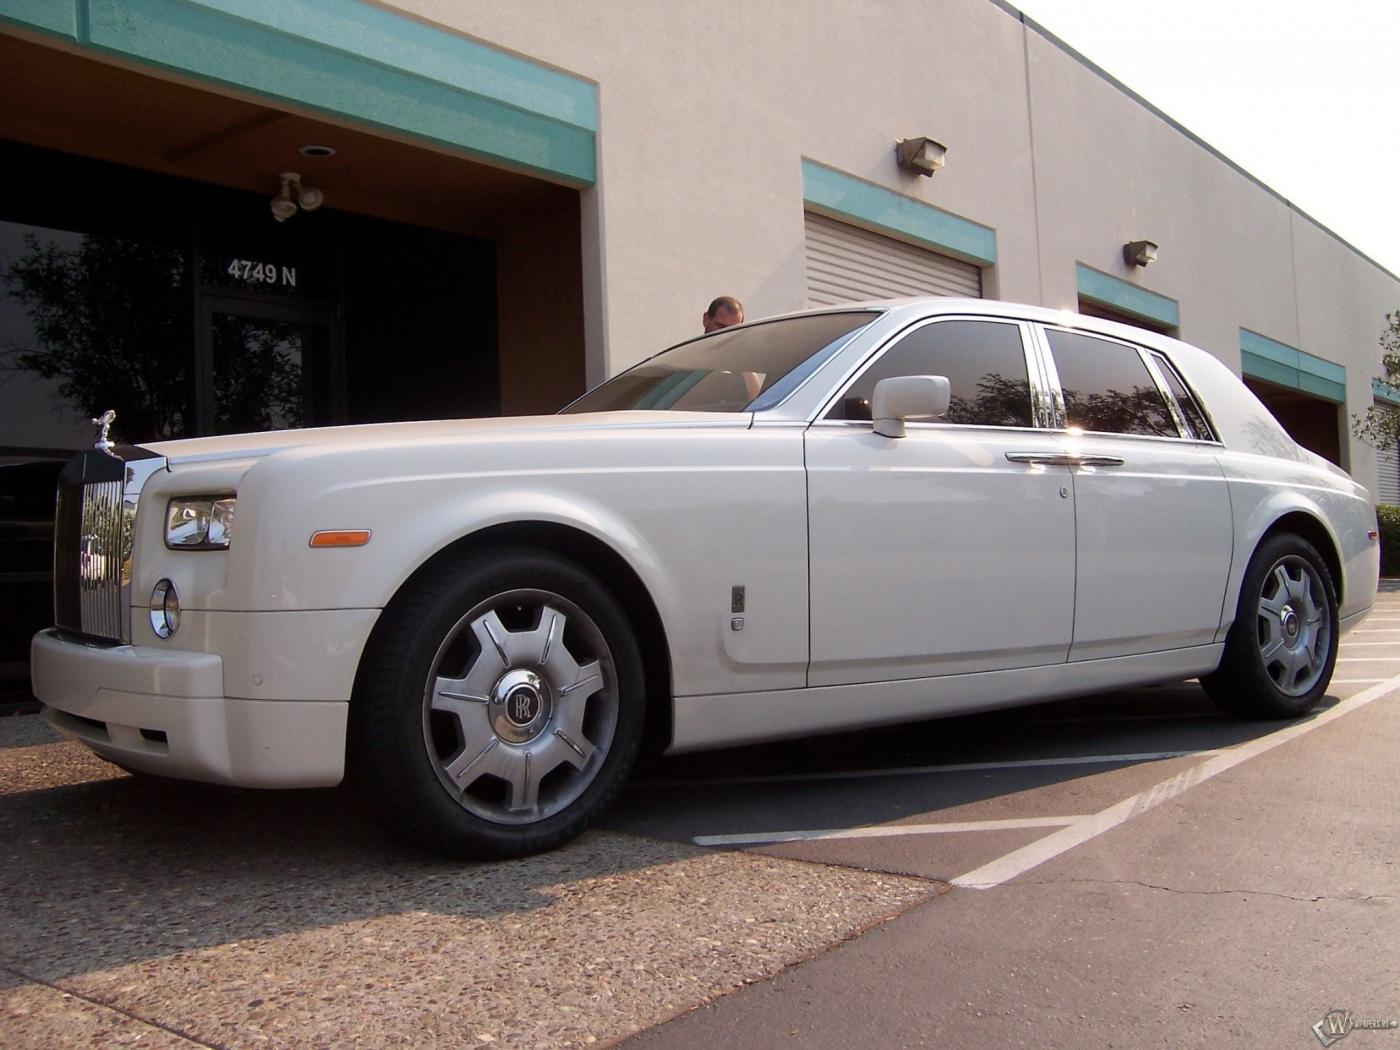 ... Royce Phantom 2005 , Rolls-Royce Phantom, 1400x1050, картинки: wpapers.ru/wallpapers/avto/other-cars/3498/1400-1050_Rolls-Royce...